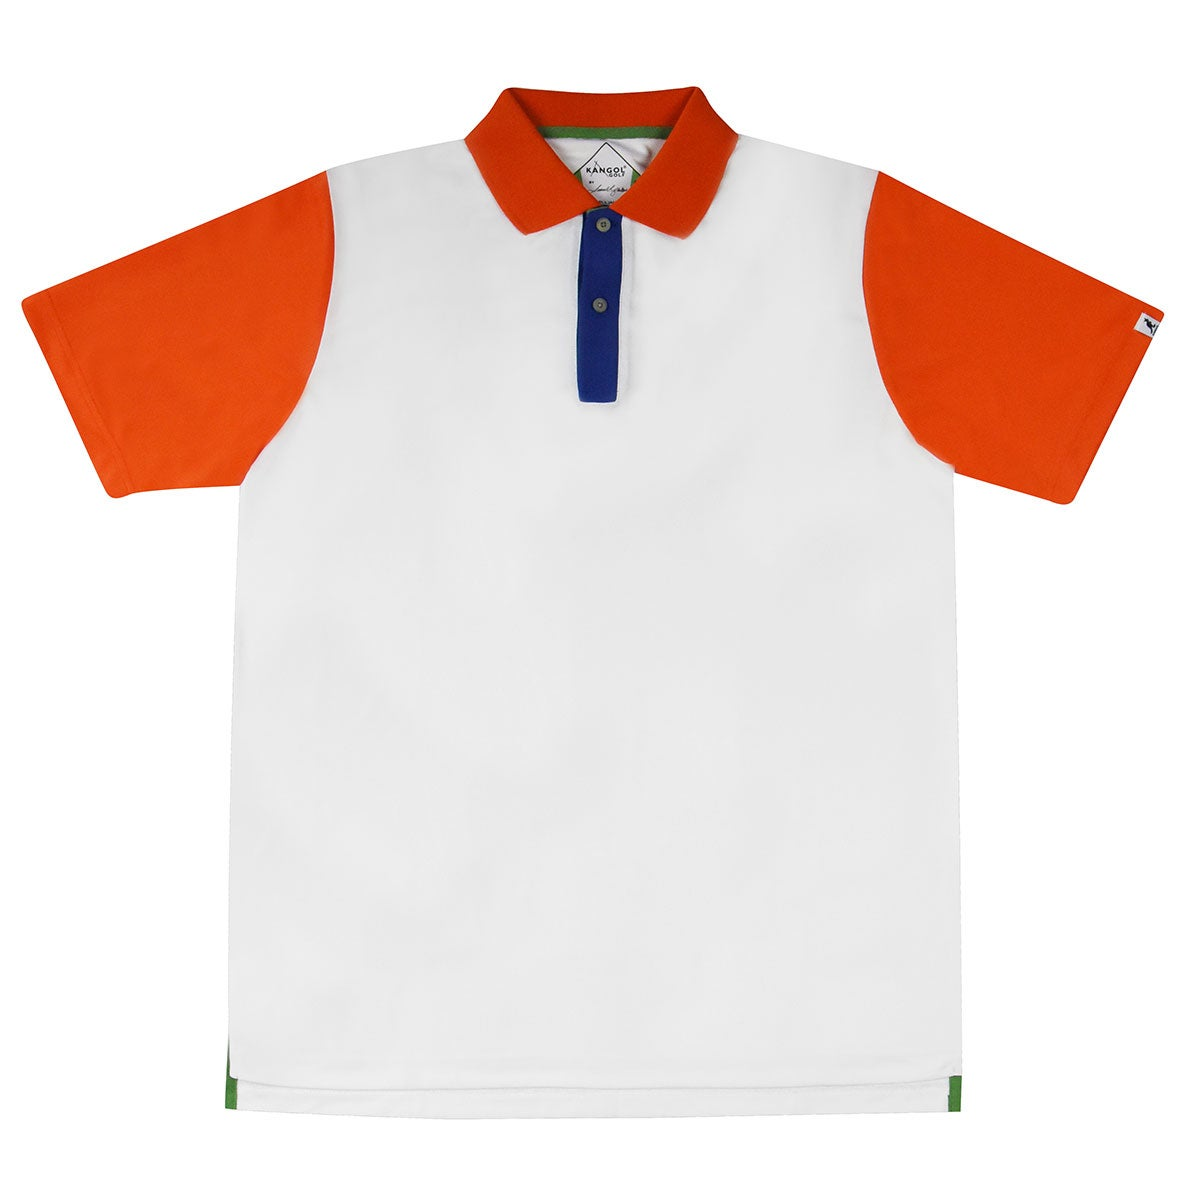 Kangol Samuel L. Jackson Golf Colour Block Polo Shirt in White